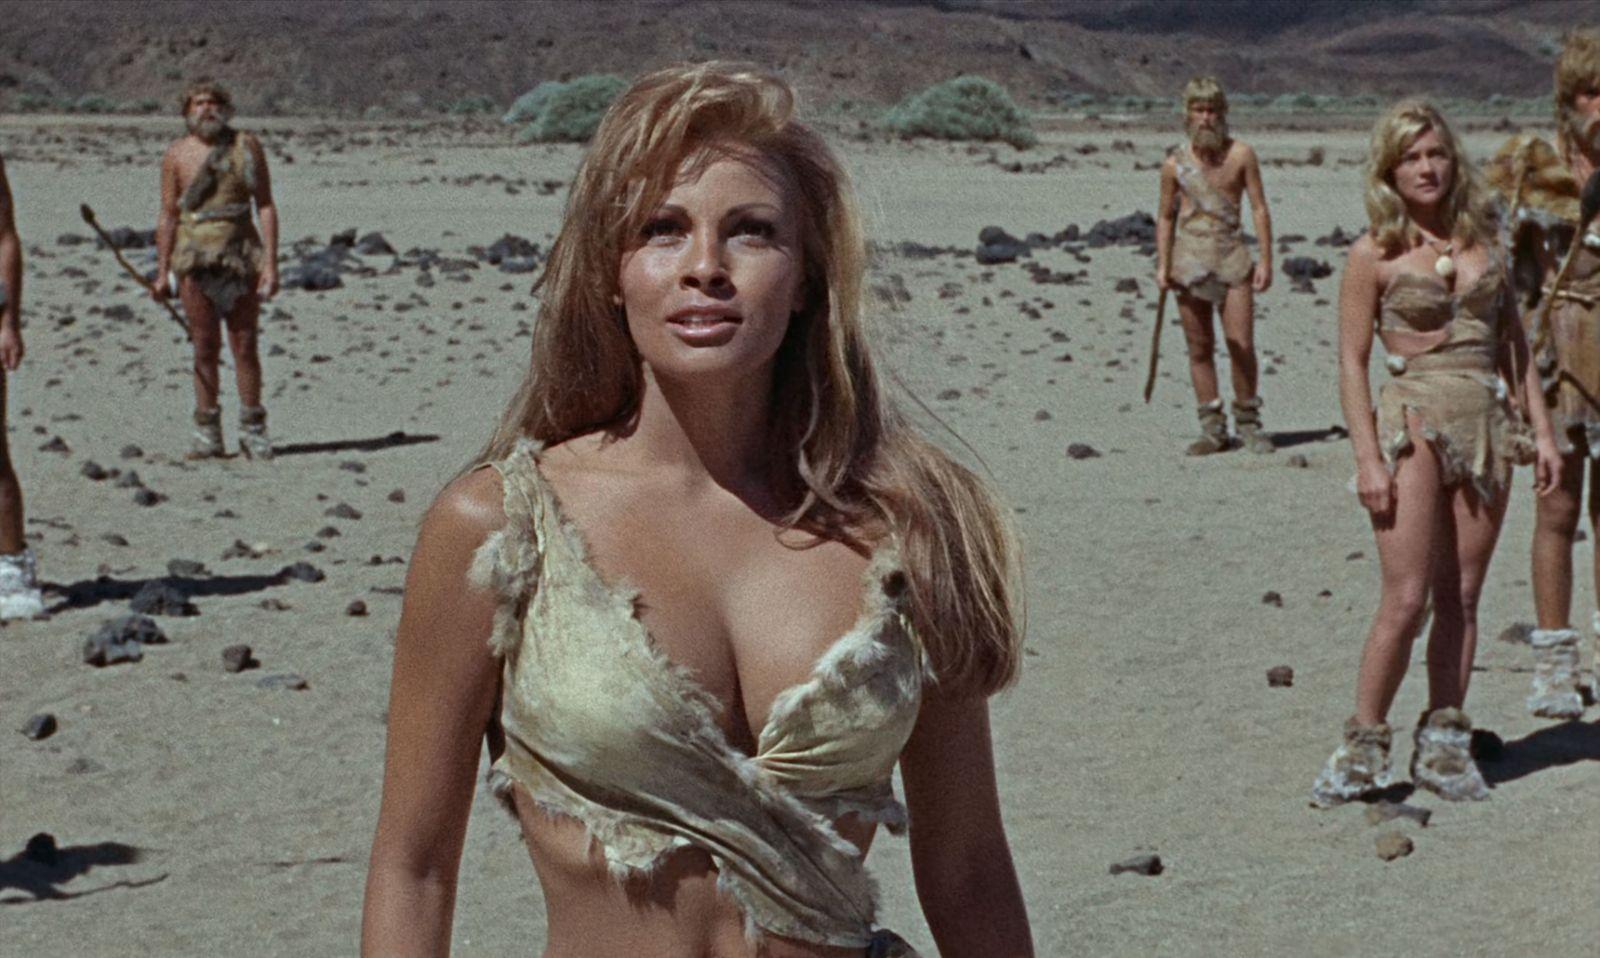 Wate On Werbung - Raquel Welch and Lisa Thomas - One Million Years B.C. (1966)